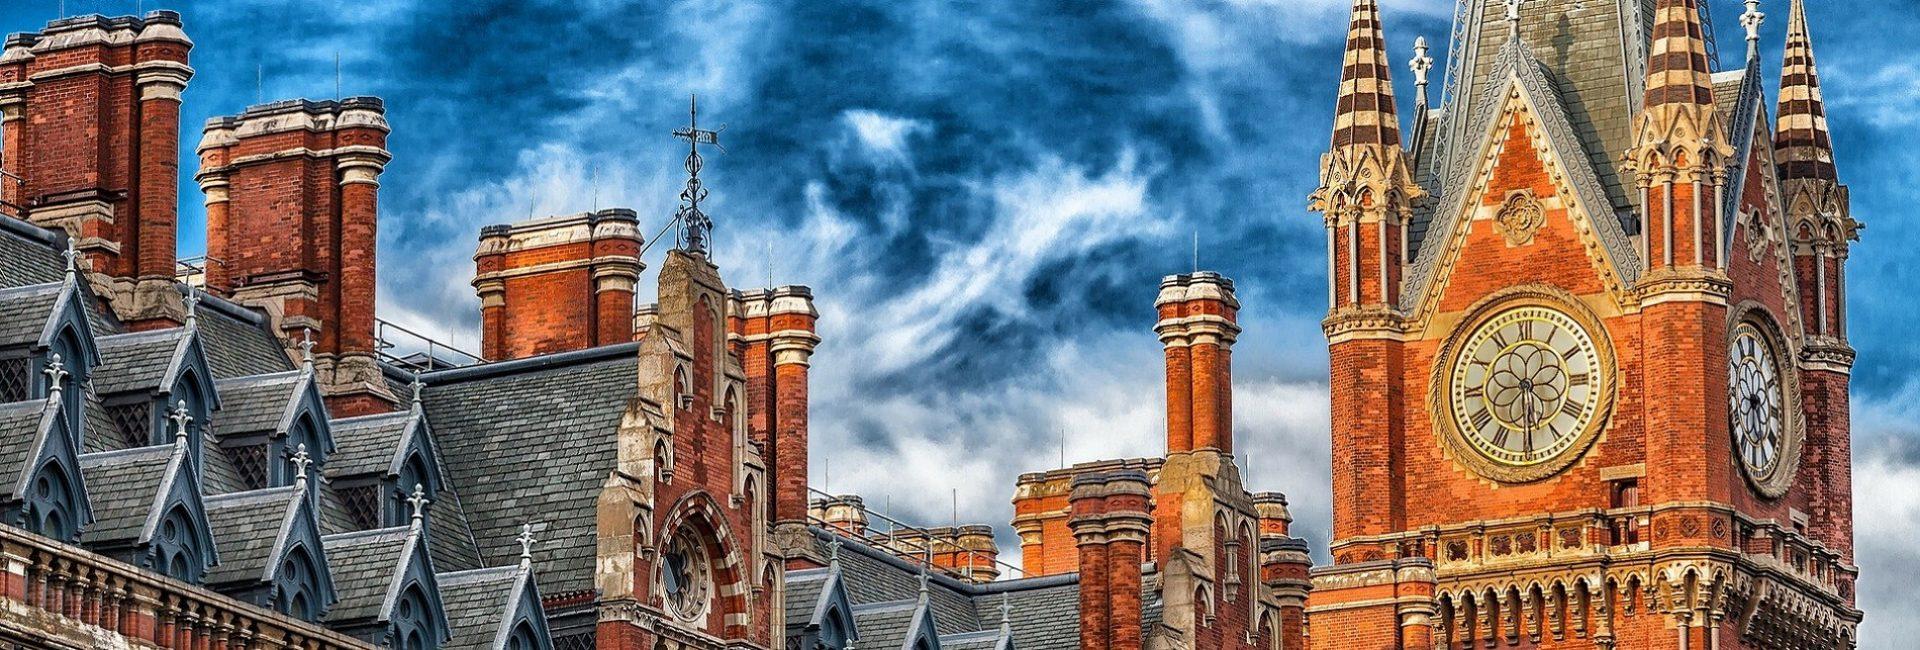 Tečaj engleskog jezika - Fraances King School of English London